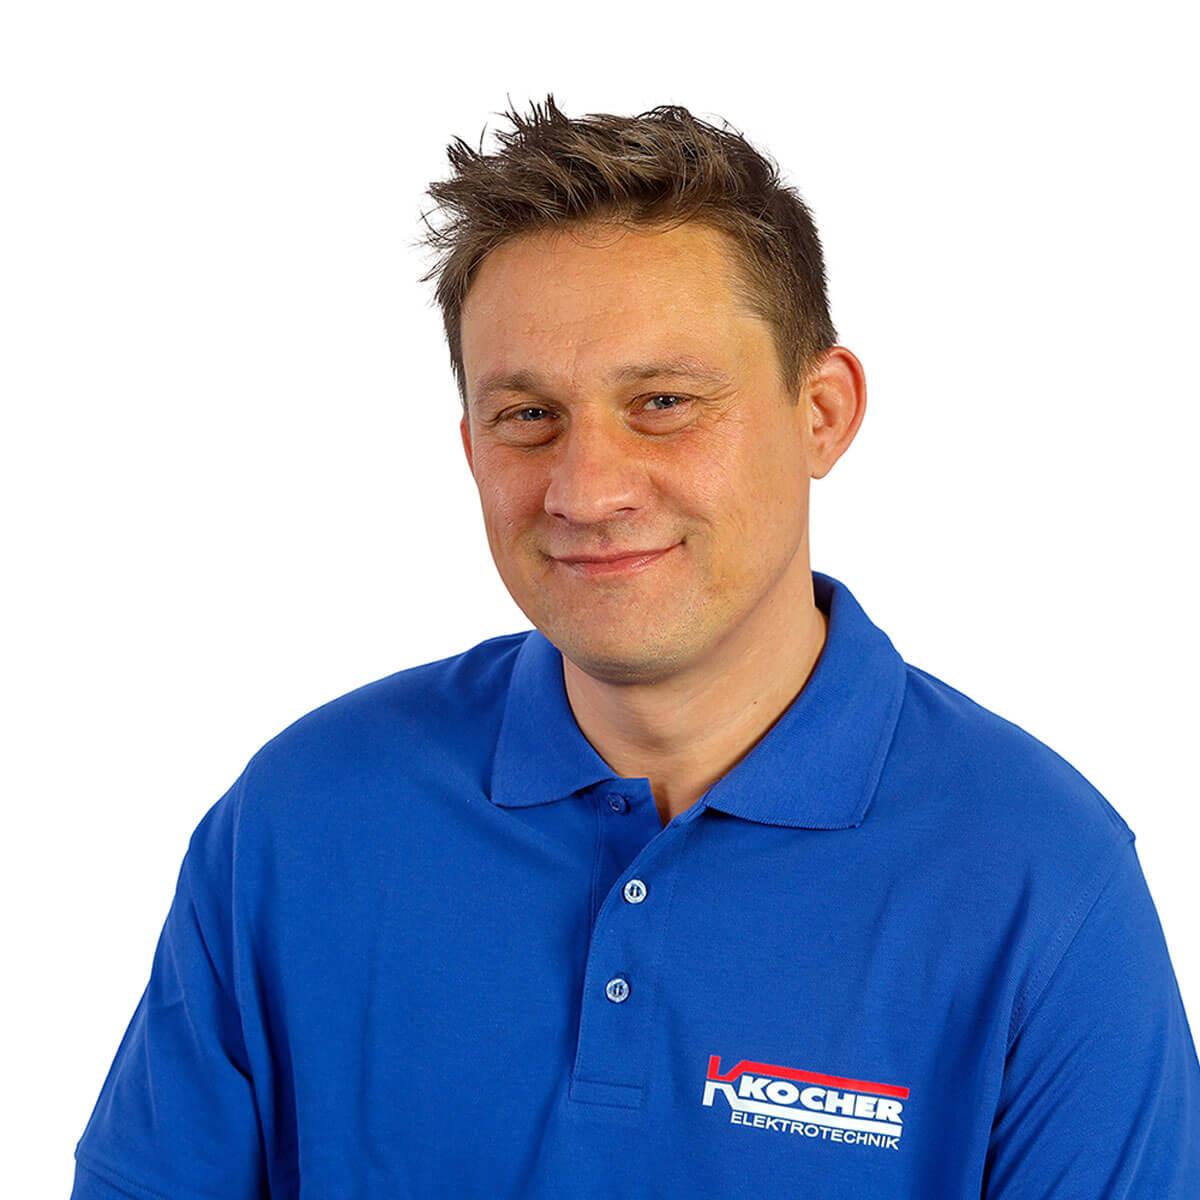 Edward Kollar ist Monteur bei Kocher Elektrotechnik in Dortmund.